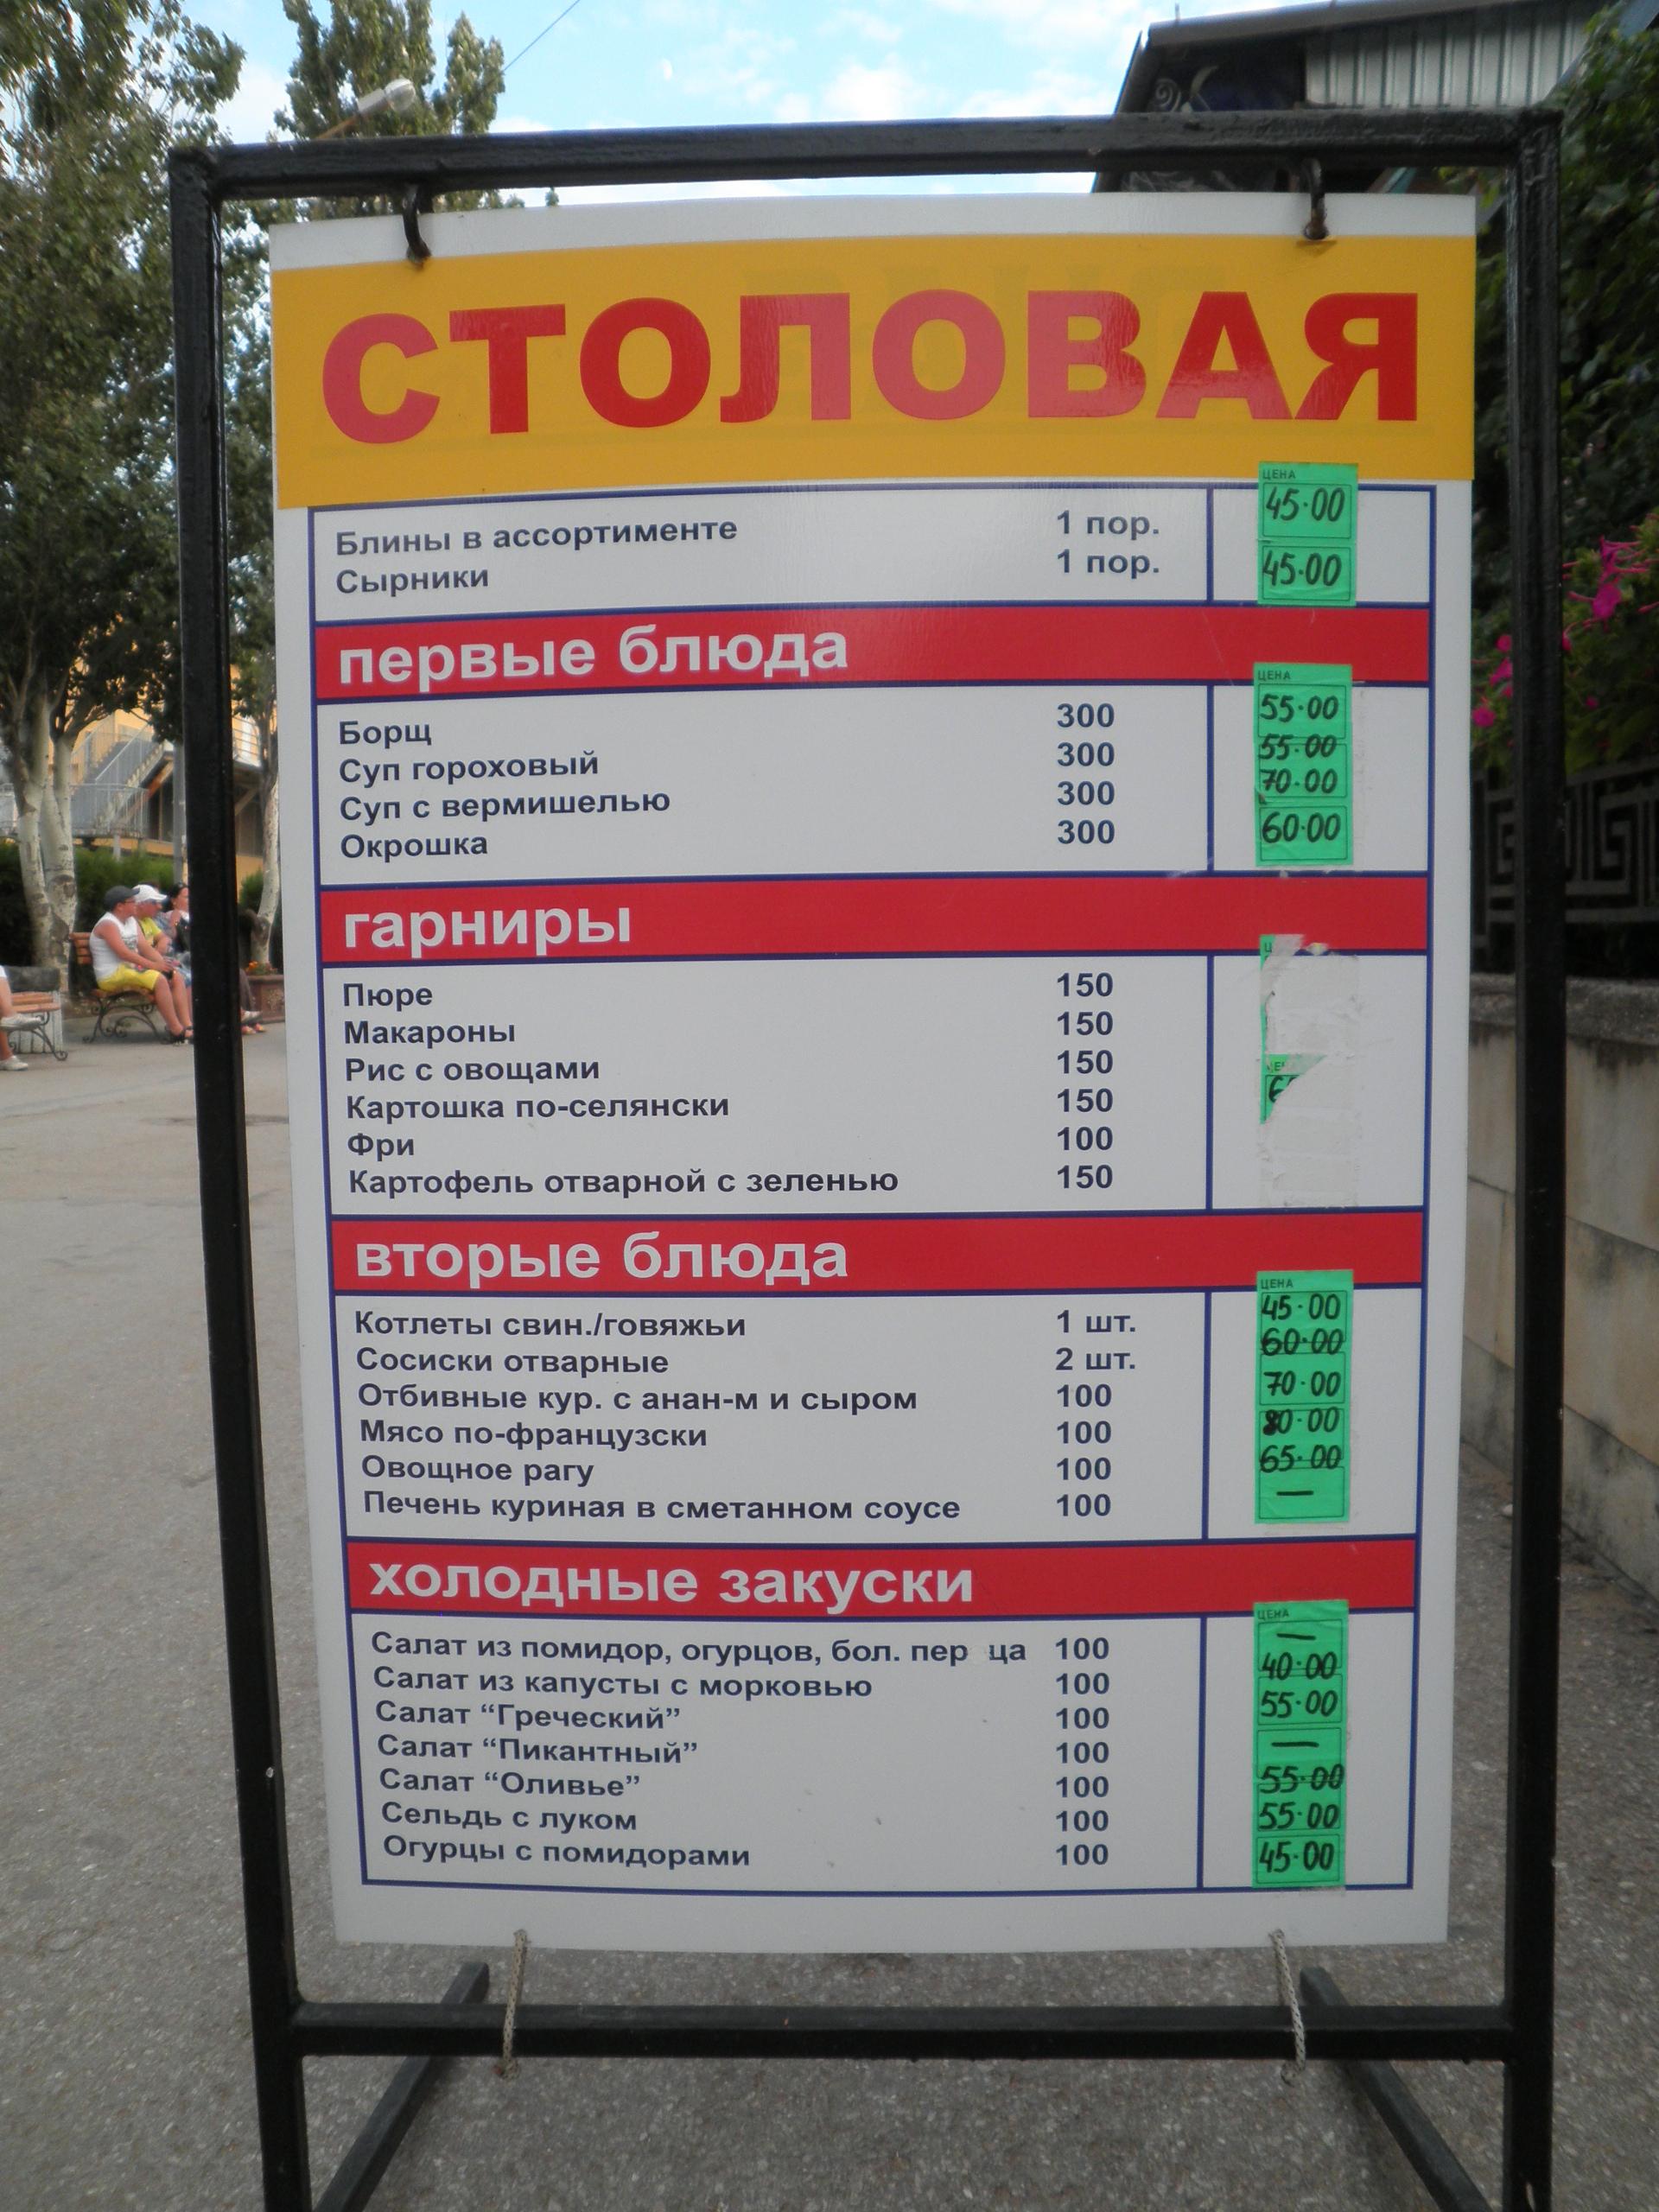 цены на еду в феодосии